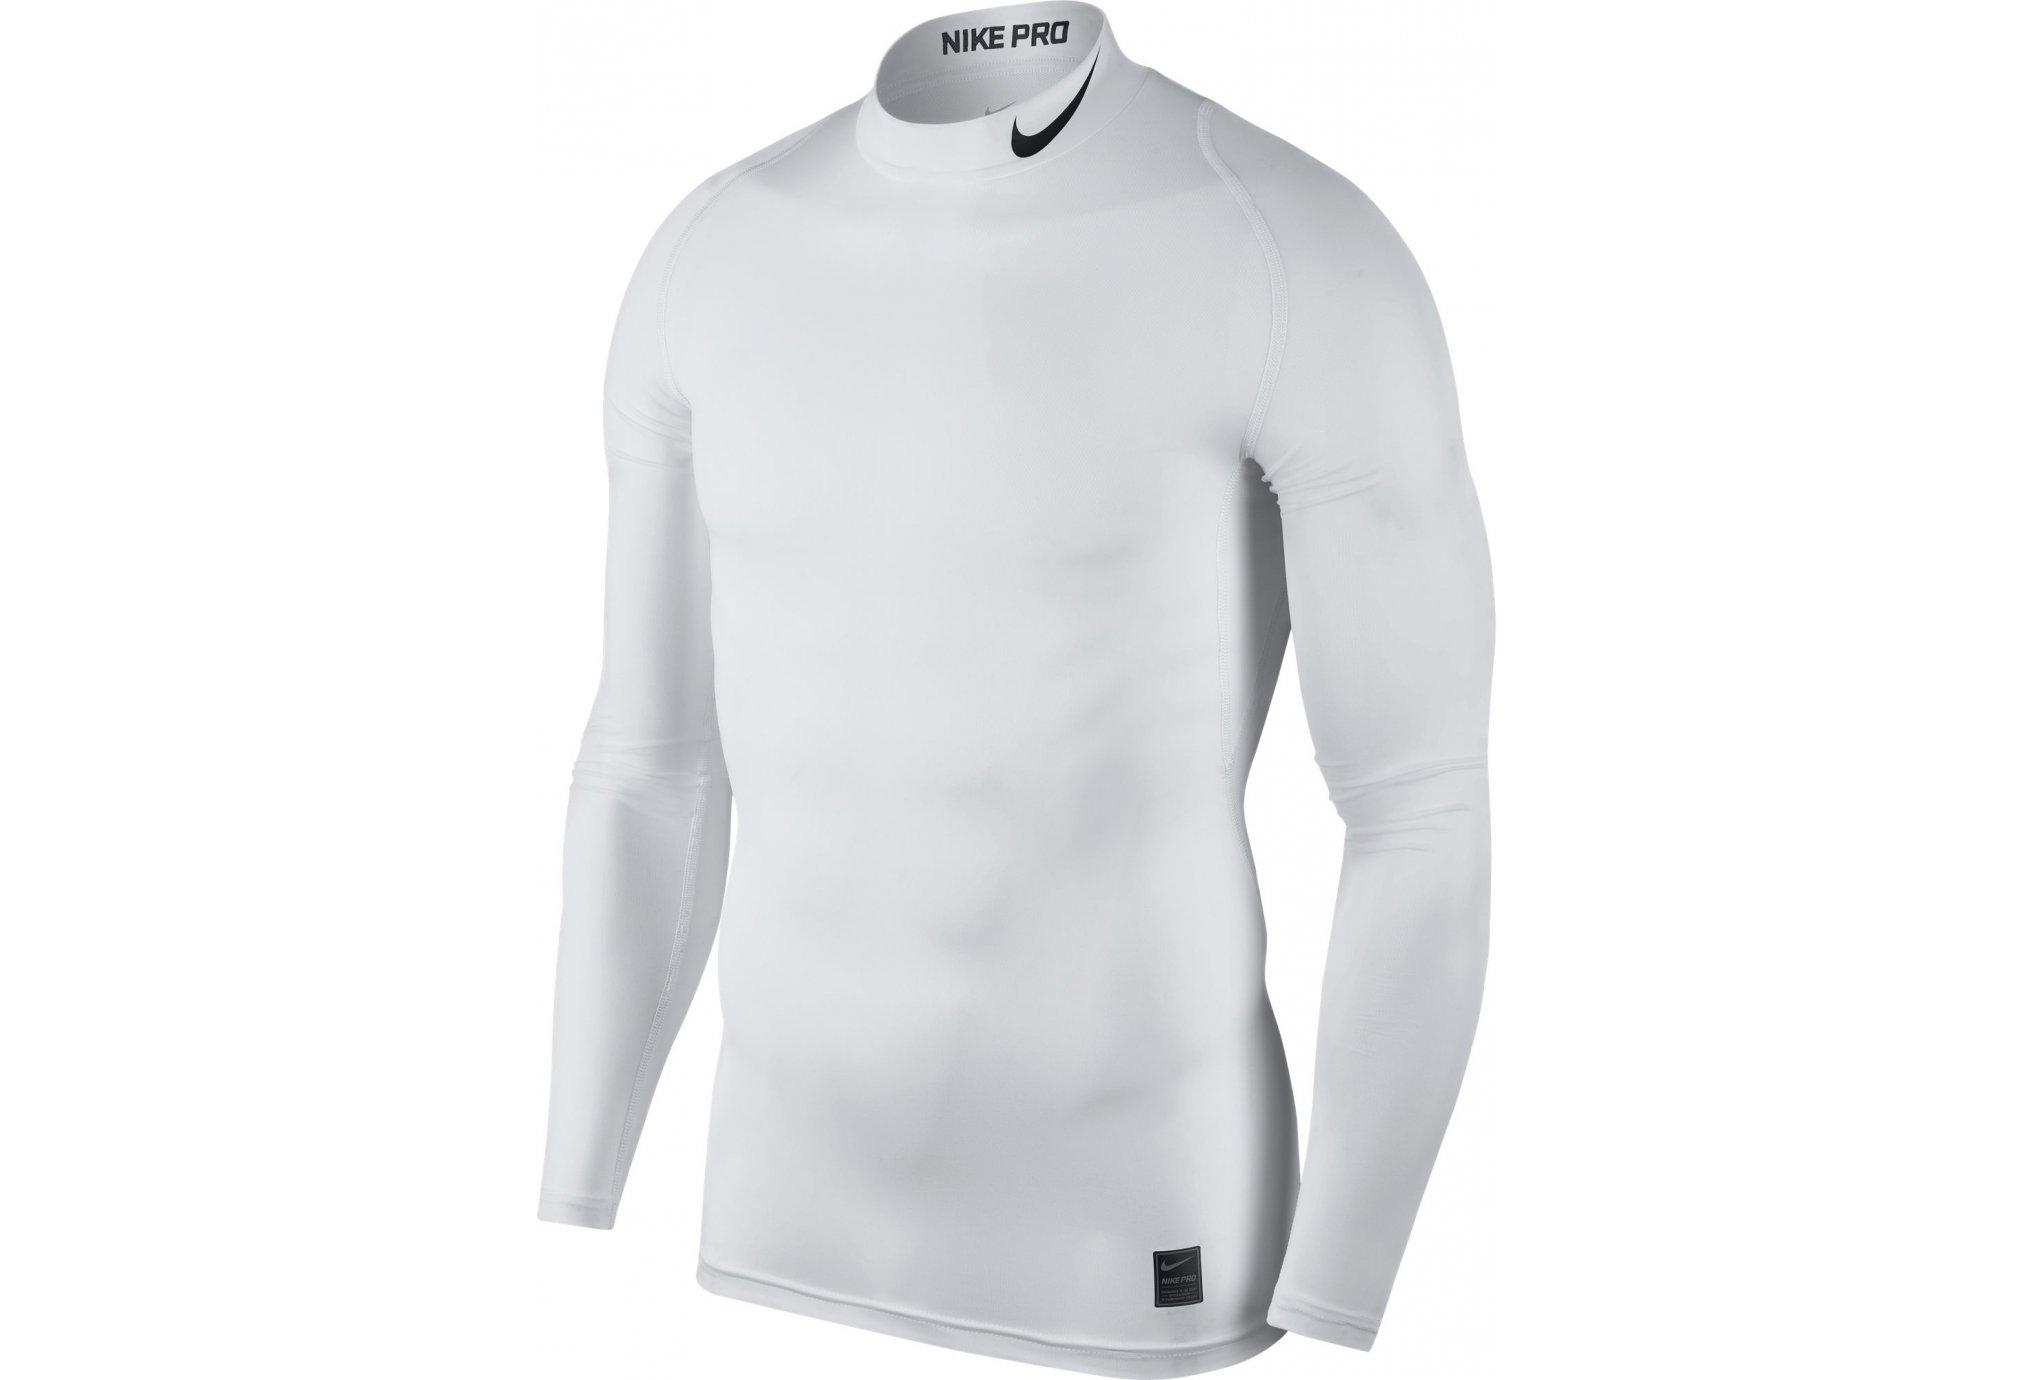 Trail Session - Nike Pro Mock M vêtement running homme 8a6550f715c5